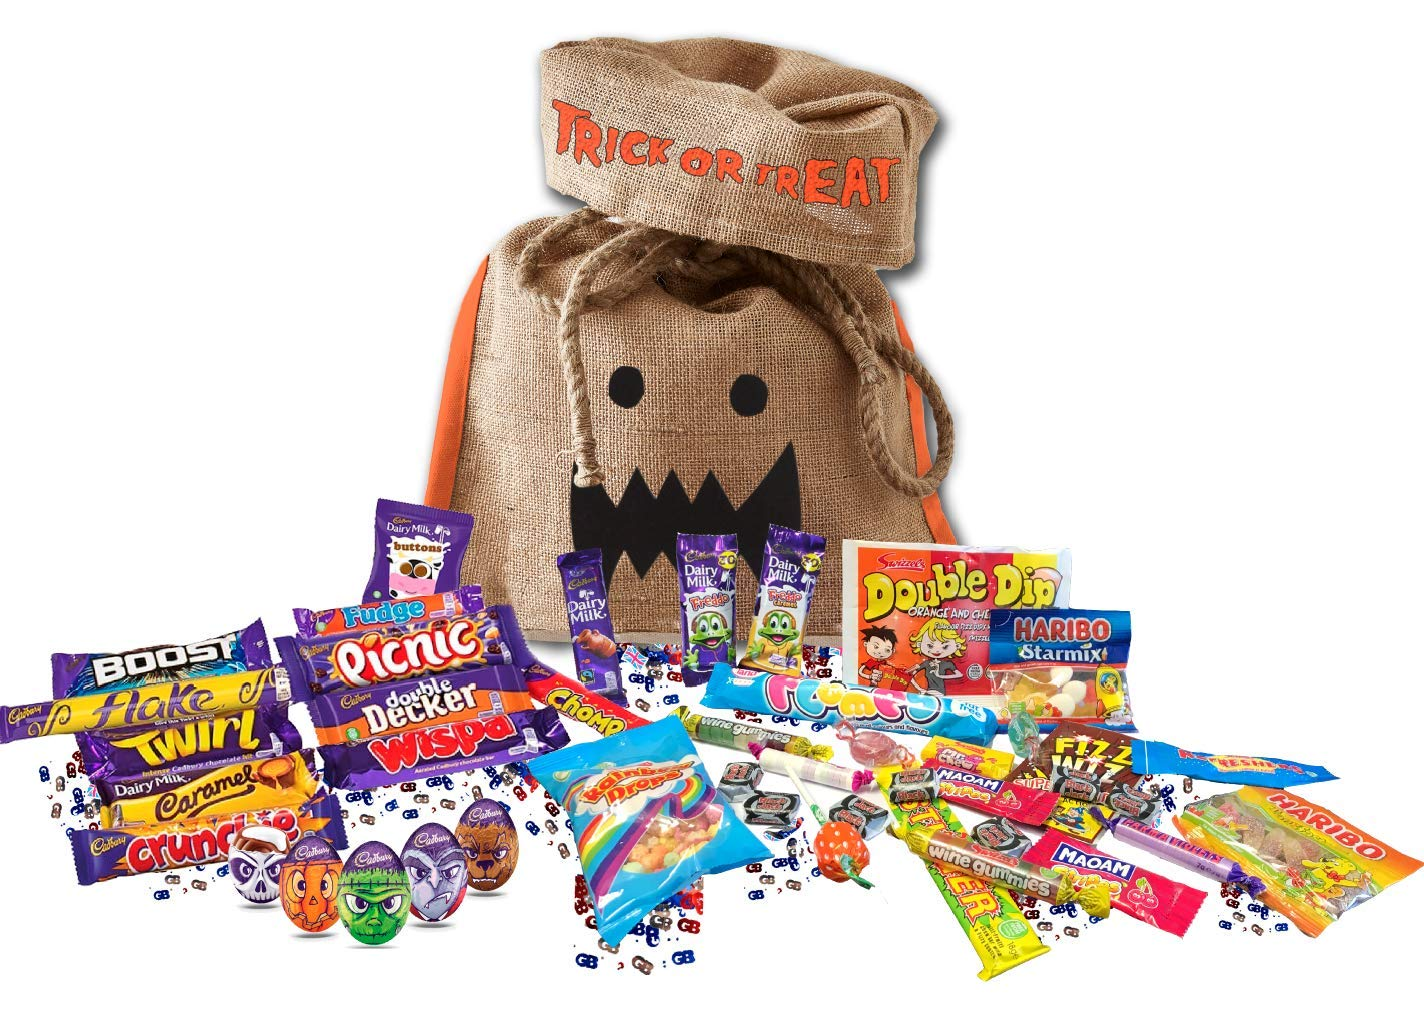 British Halloween Trick Or Treat Candy Bag | 5 Cadbury Goo Heads Halloween Creme Eggs, 15 Cadbury's chocolate bars & 8.8 oz English Retro Candy Mix Assortment Cadbury Variety